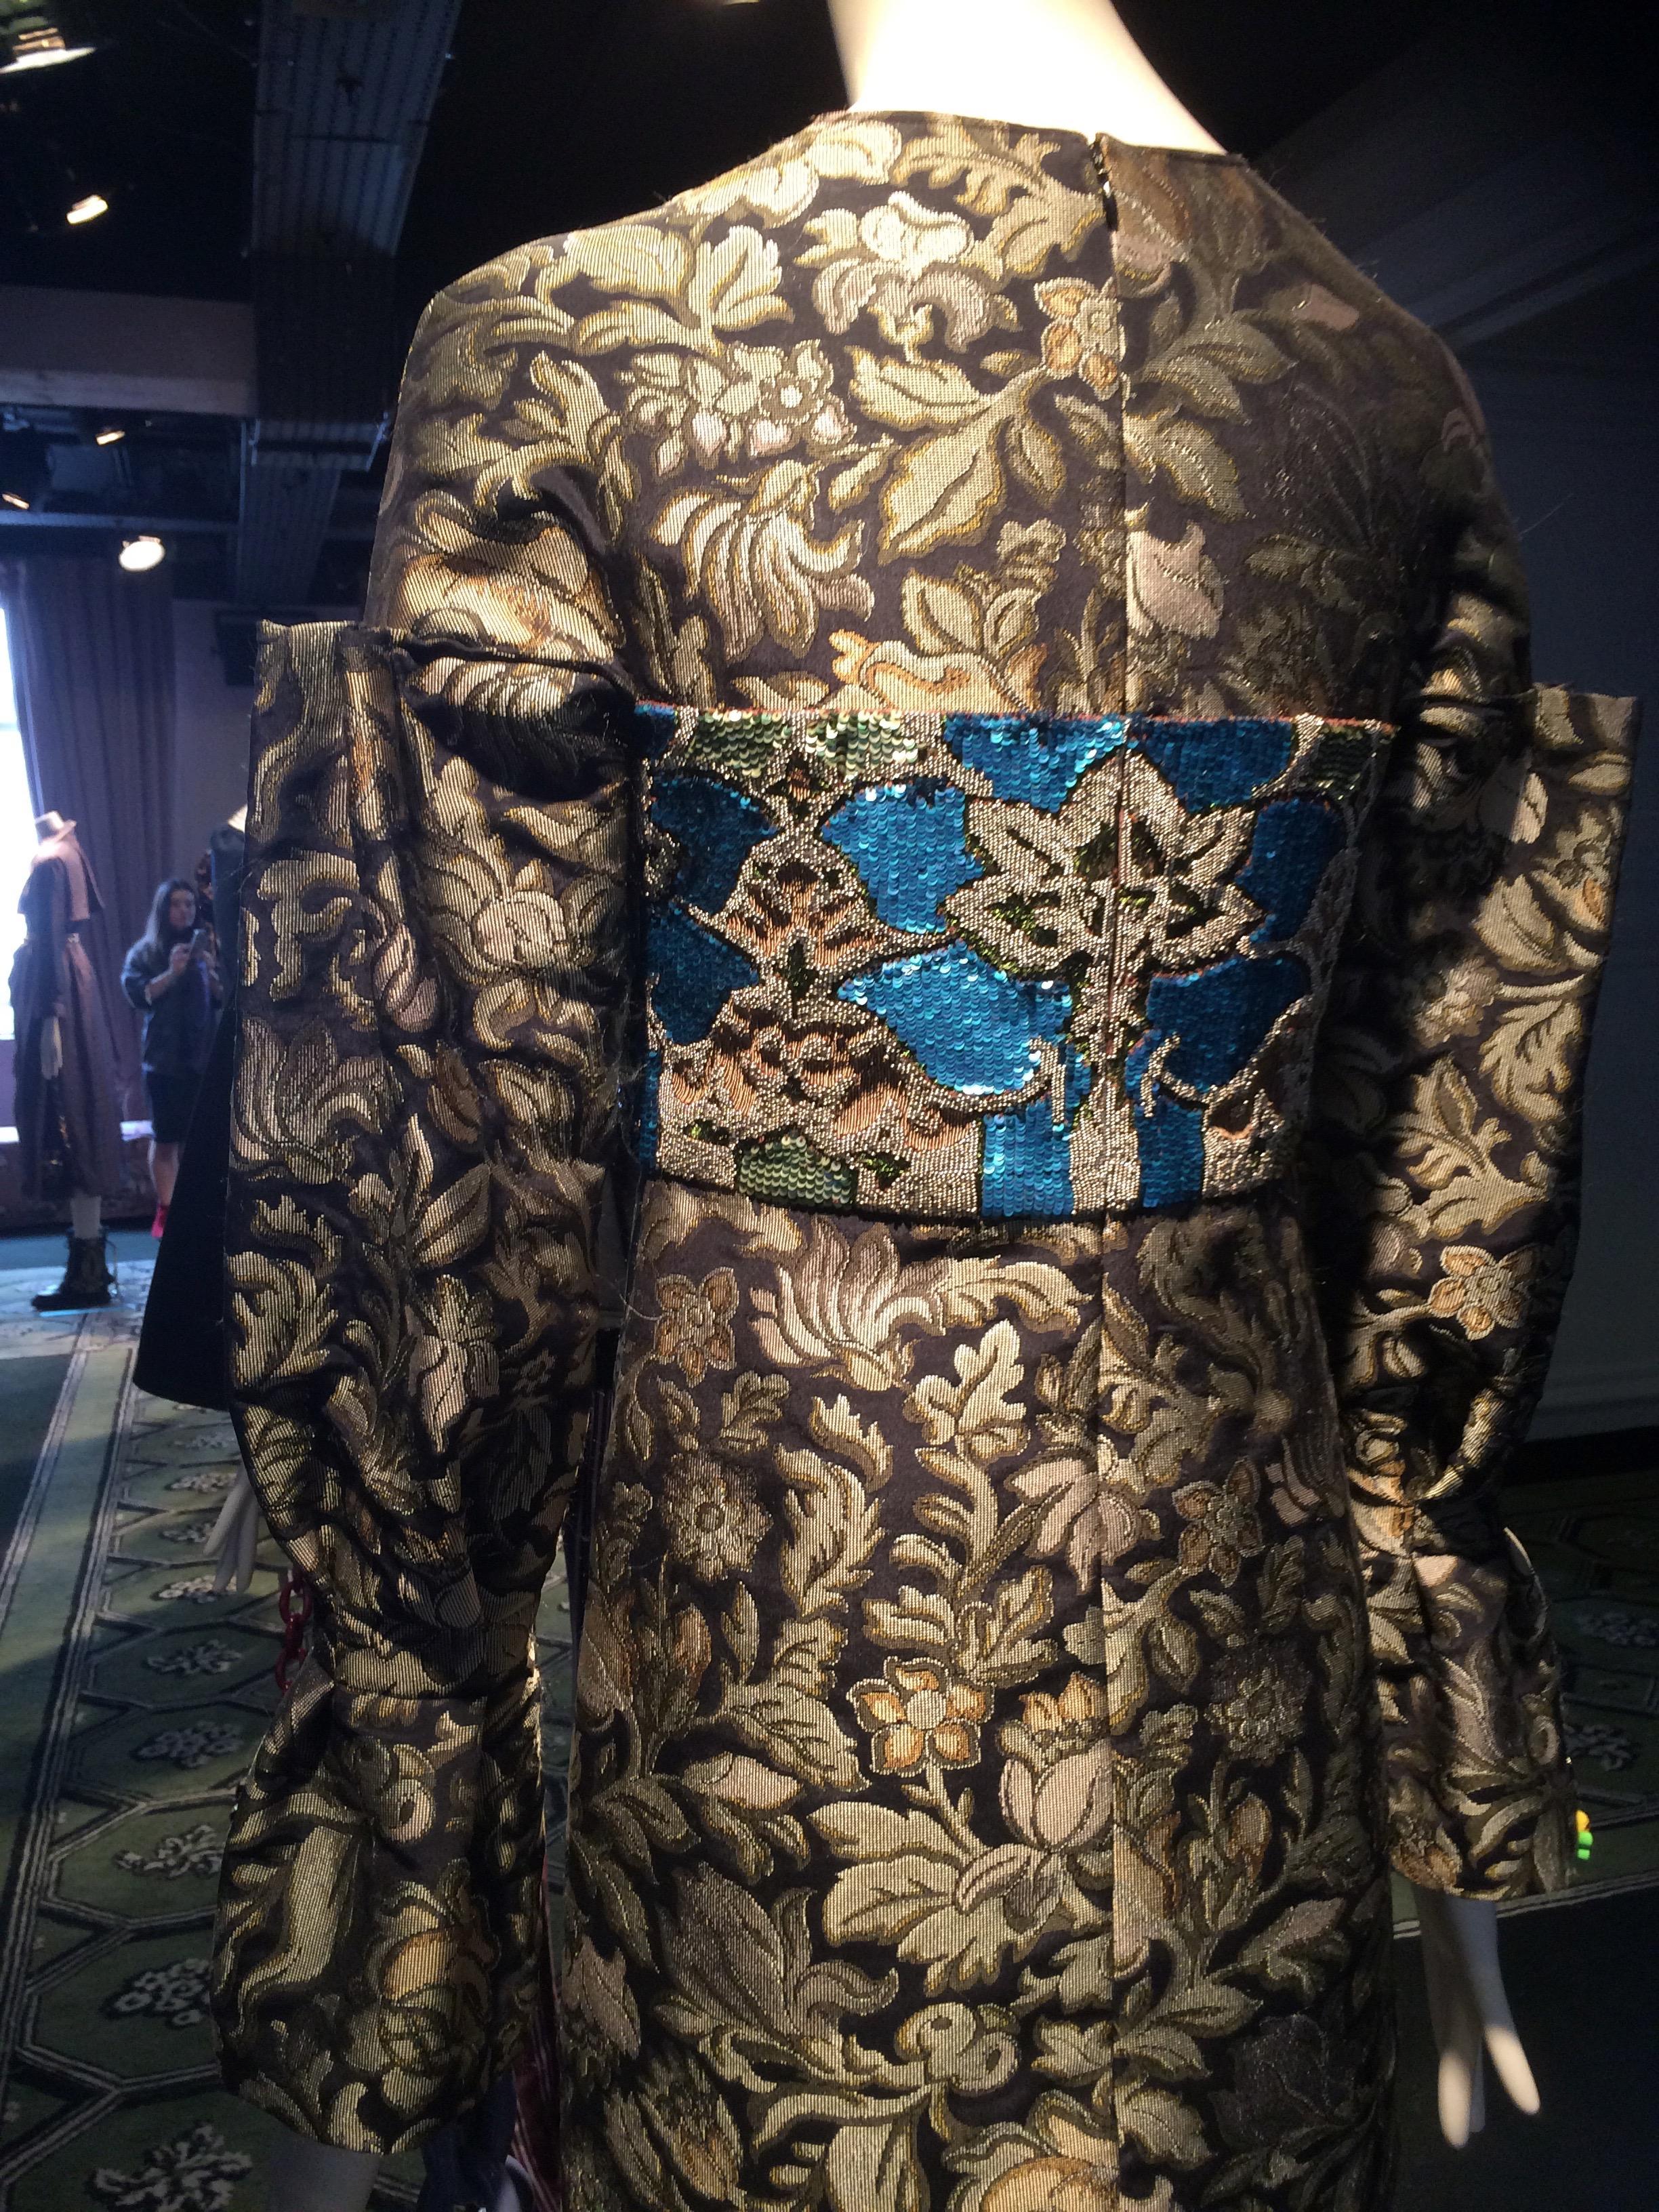 Brocaded Obi coat Burberry 2016/17